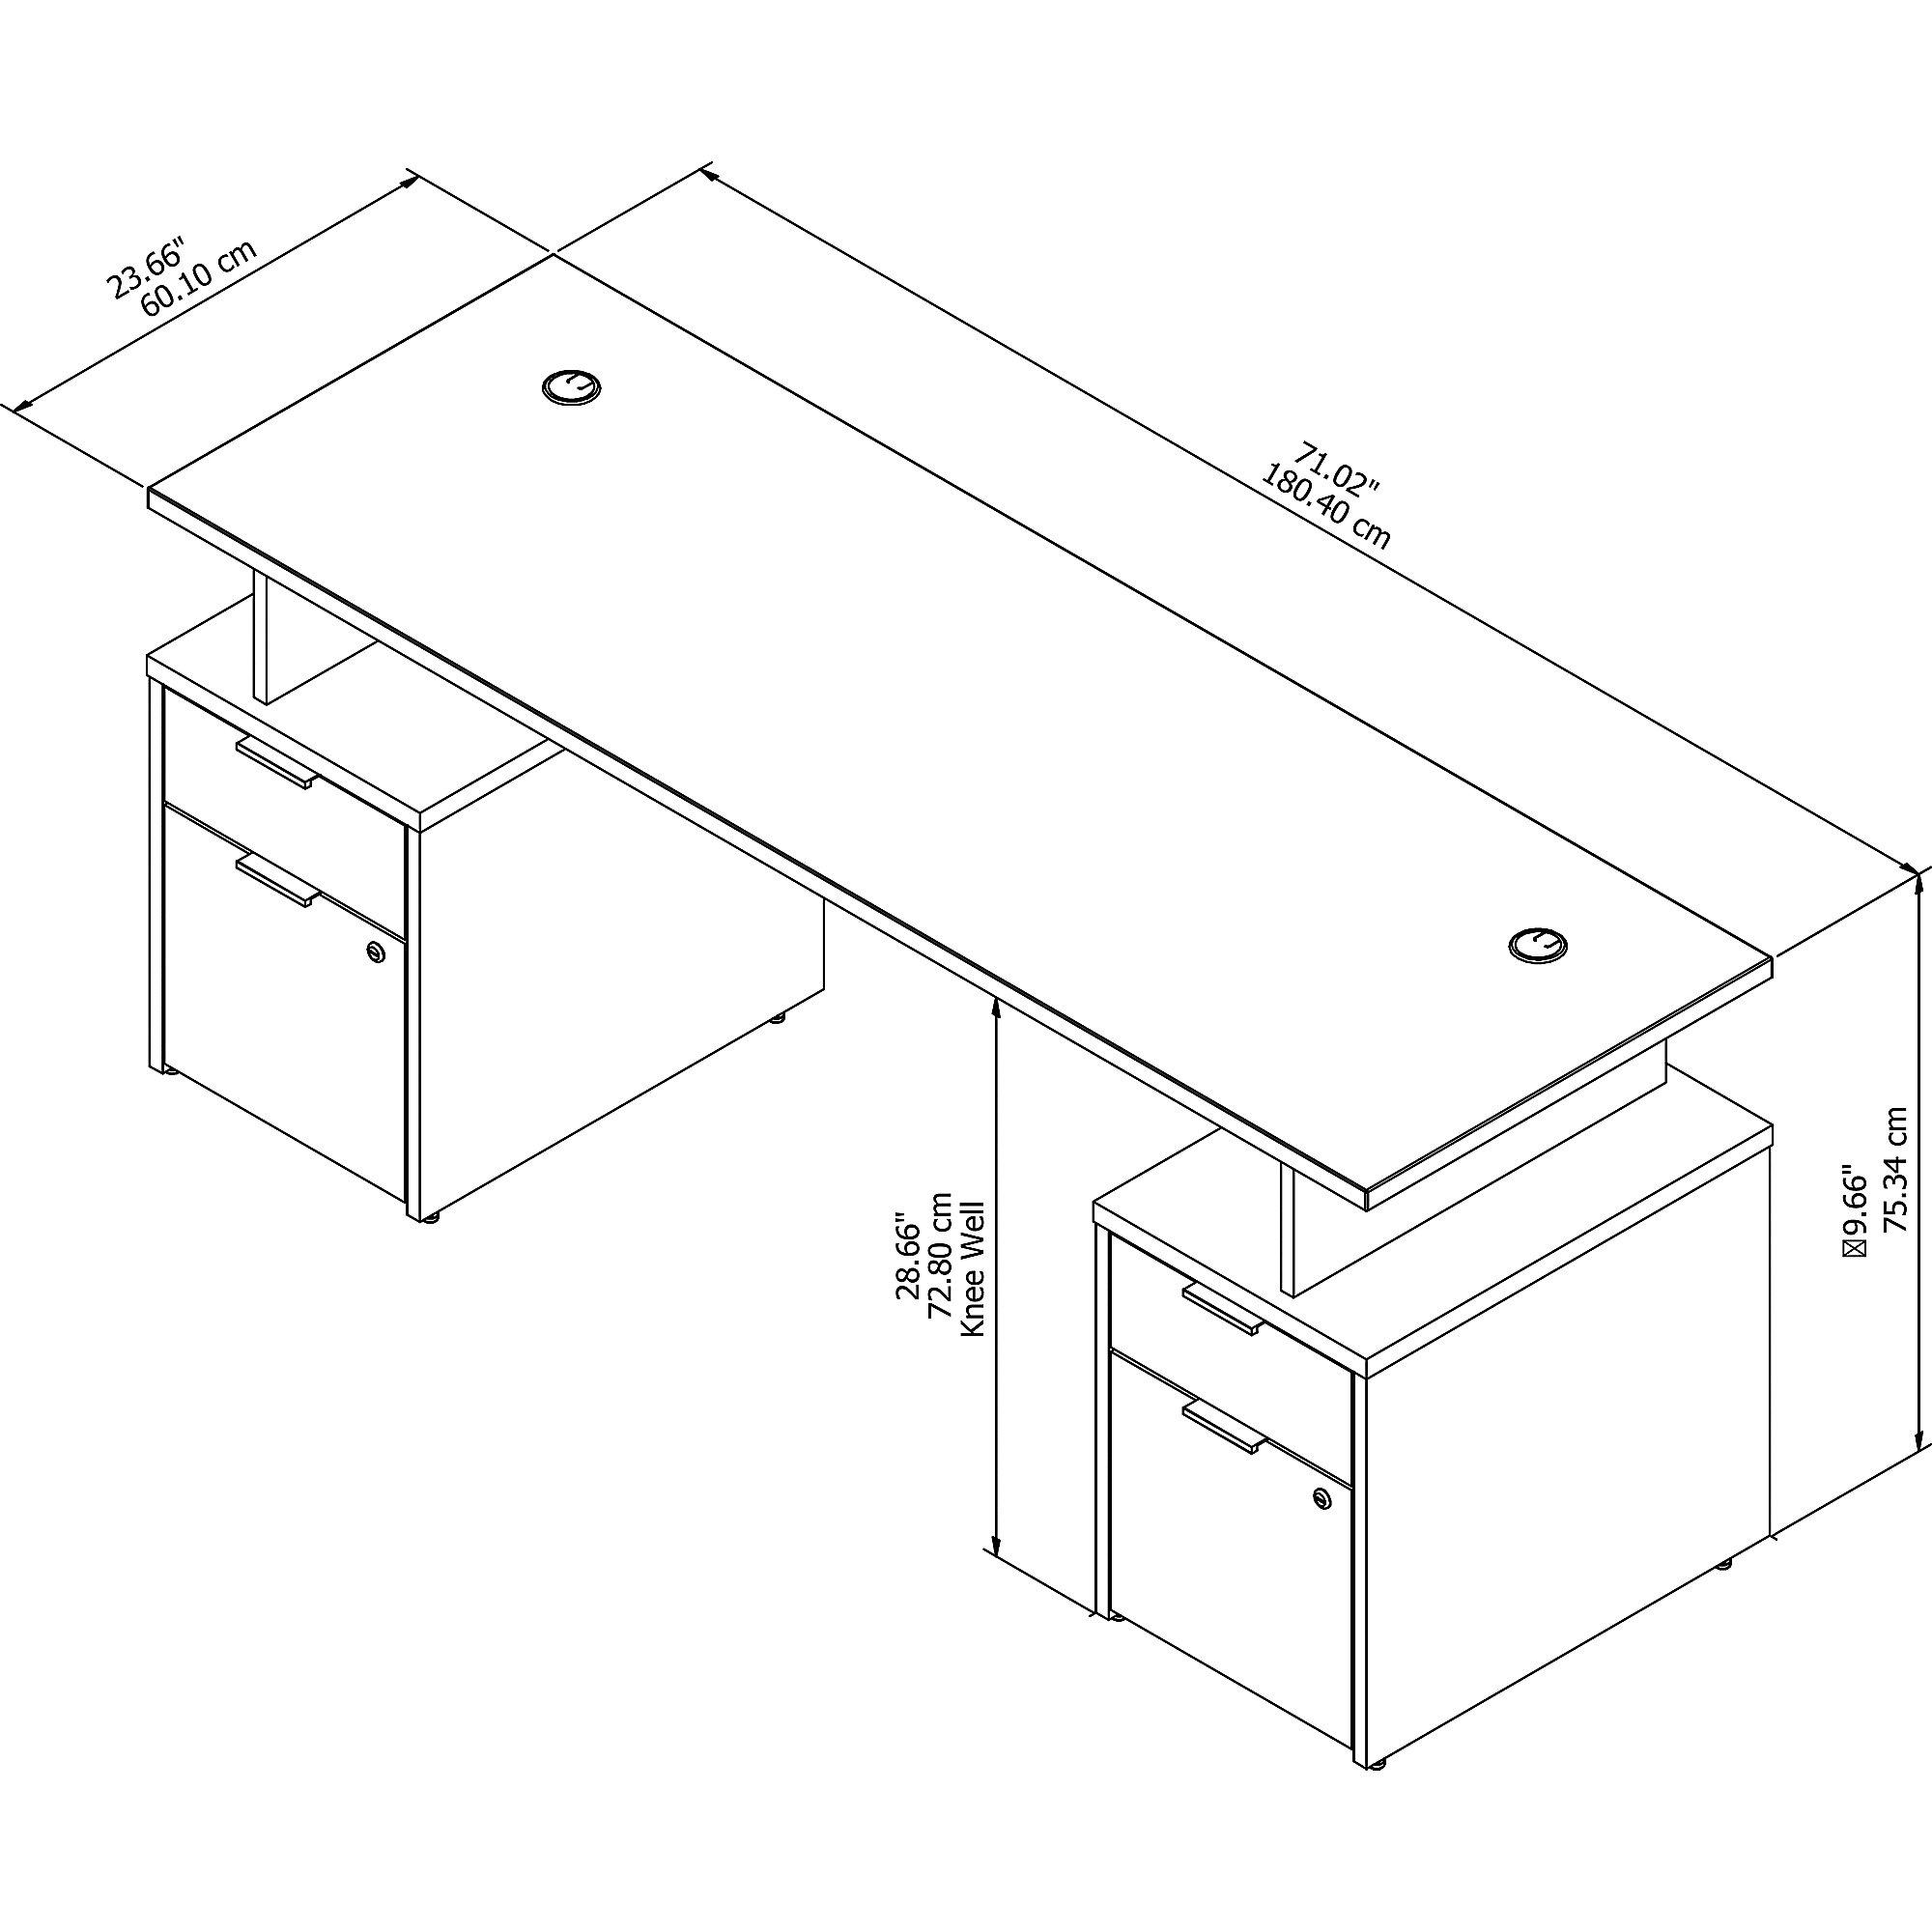 jtn005 jamestown desk dimensions